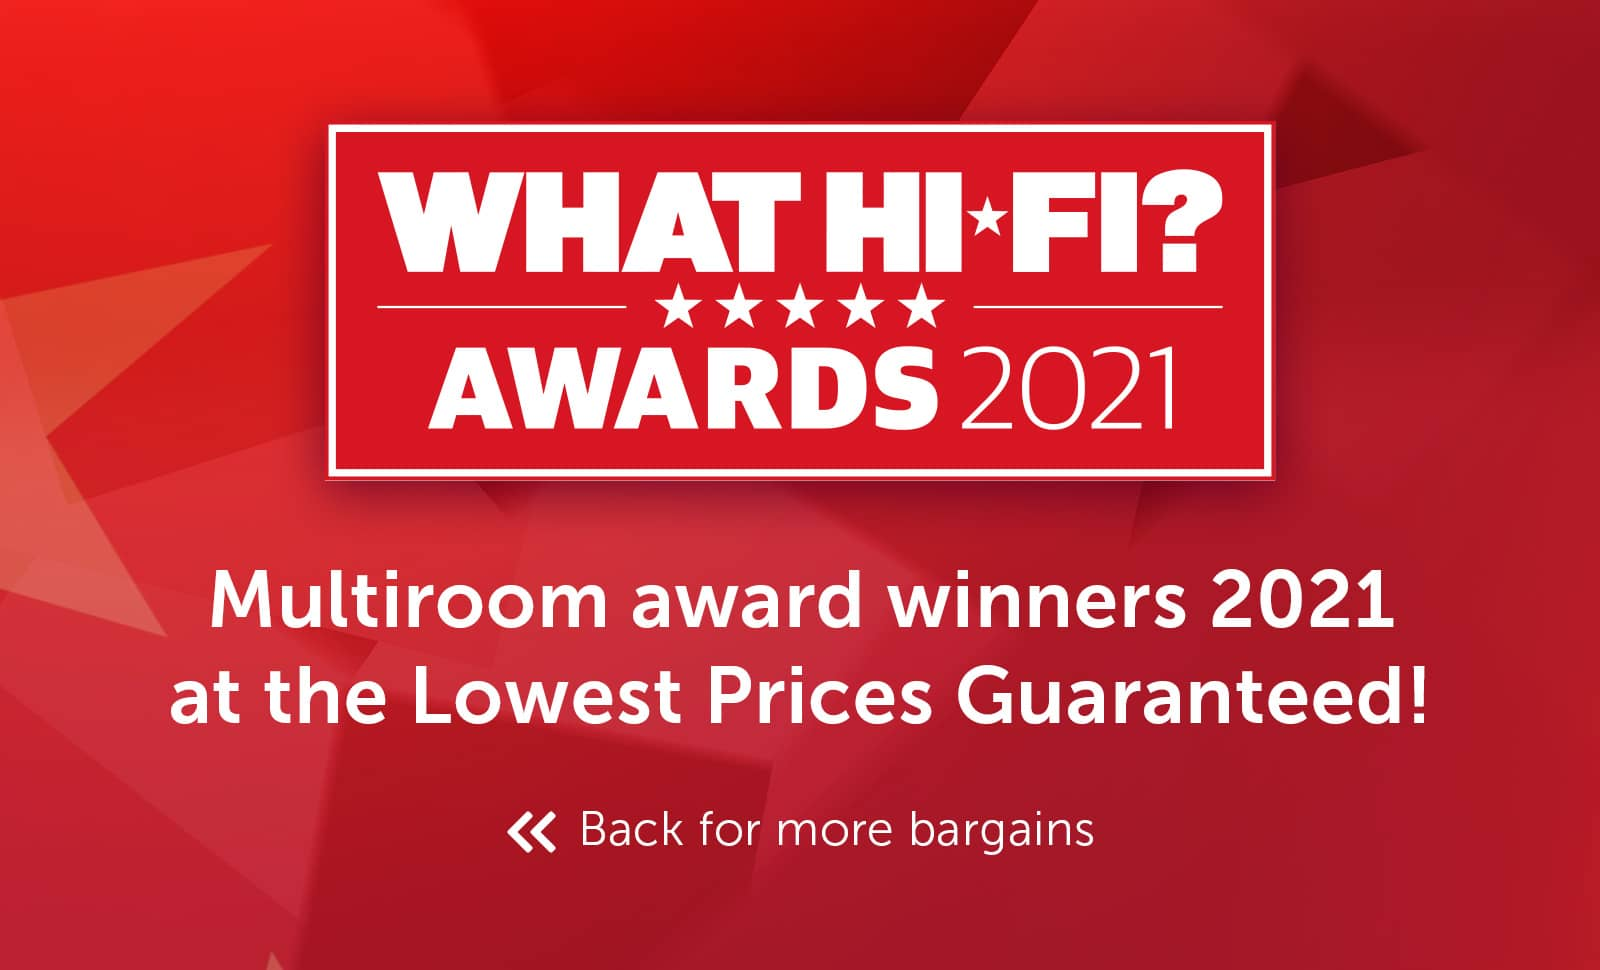 What Hi-Fi? Best Buy Awards 2021 - Multiroom